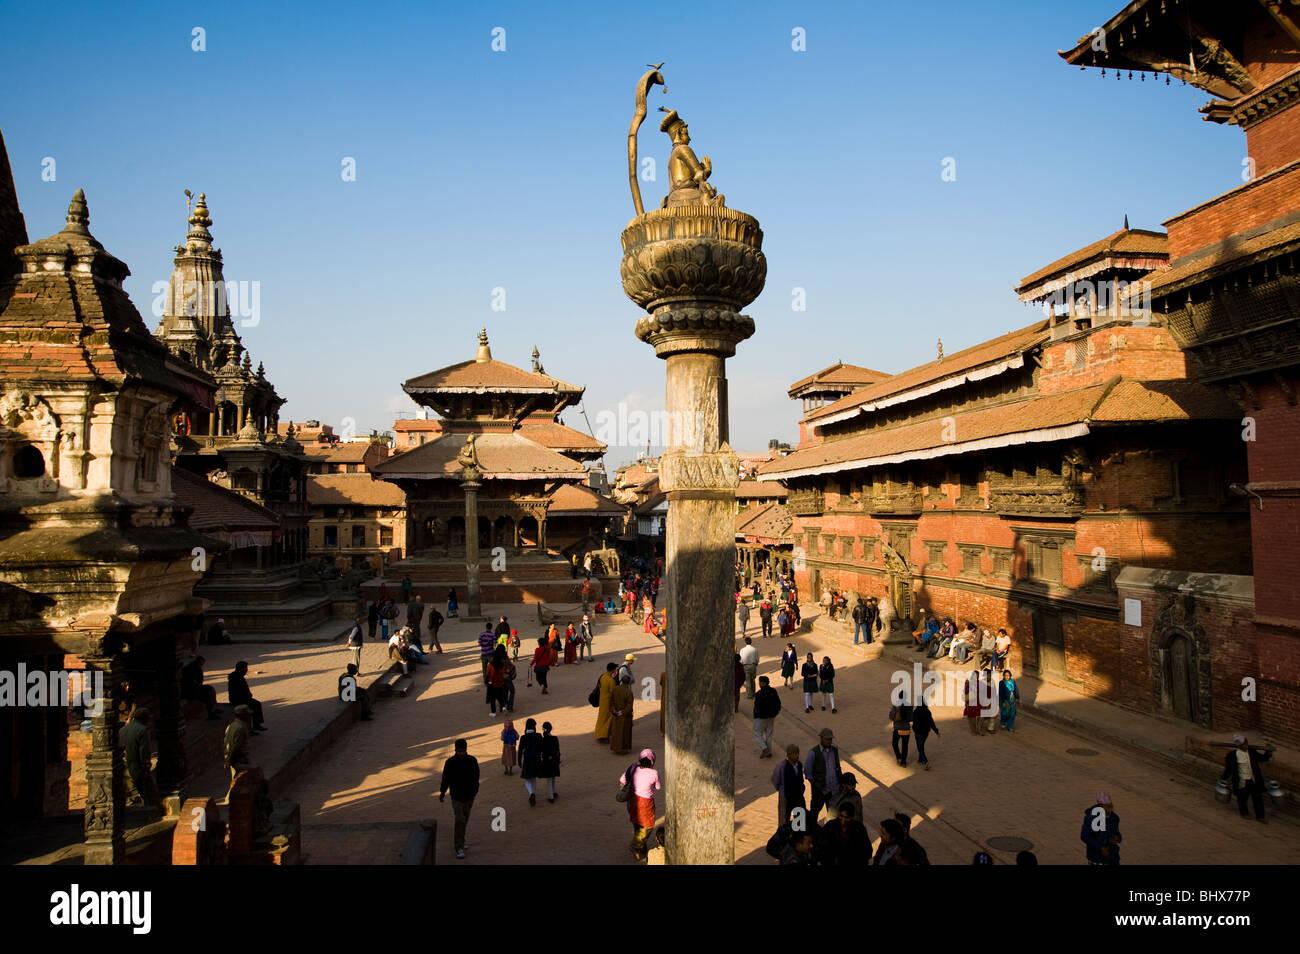 Patan Museum di Durbar Square, Kathmandu, Nepal Immagini Stock